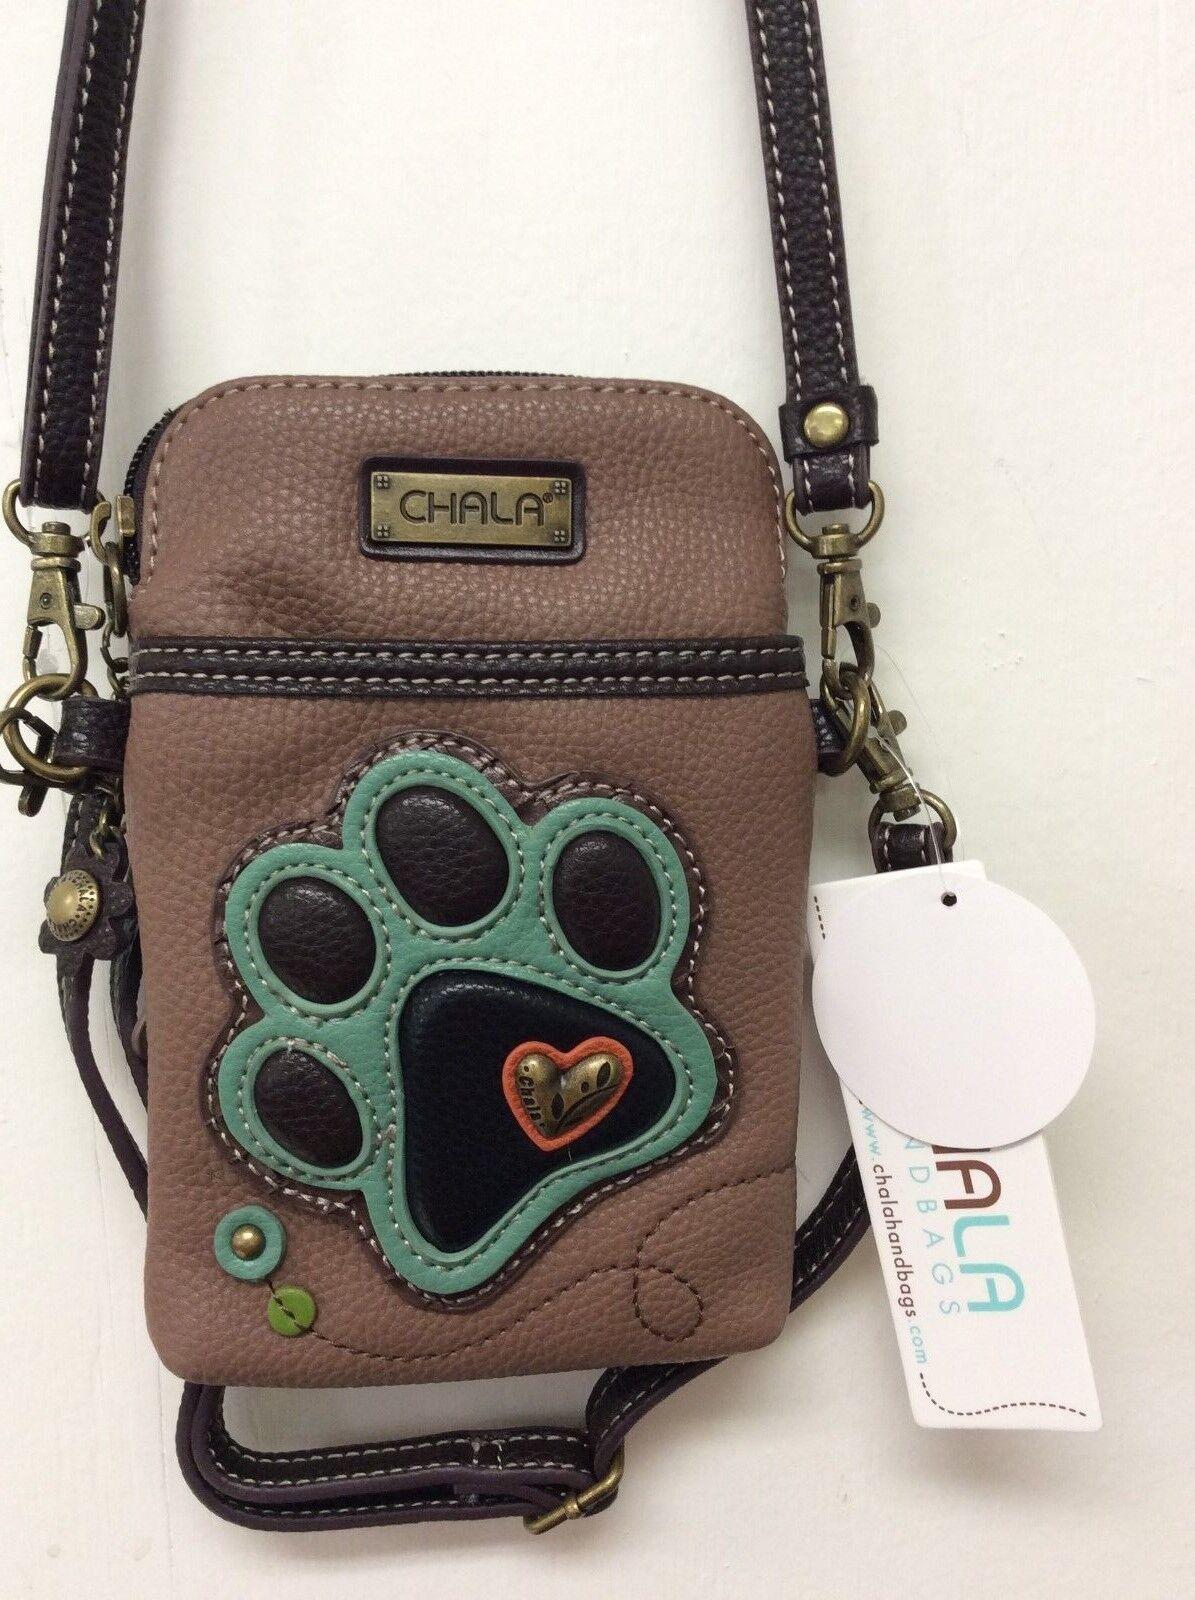 Chala Dog Paw Print Cell Phone Crossbody Small Convertible P